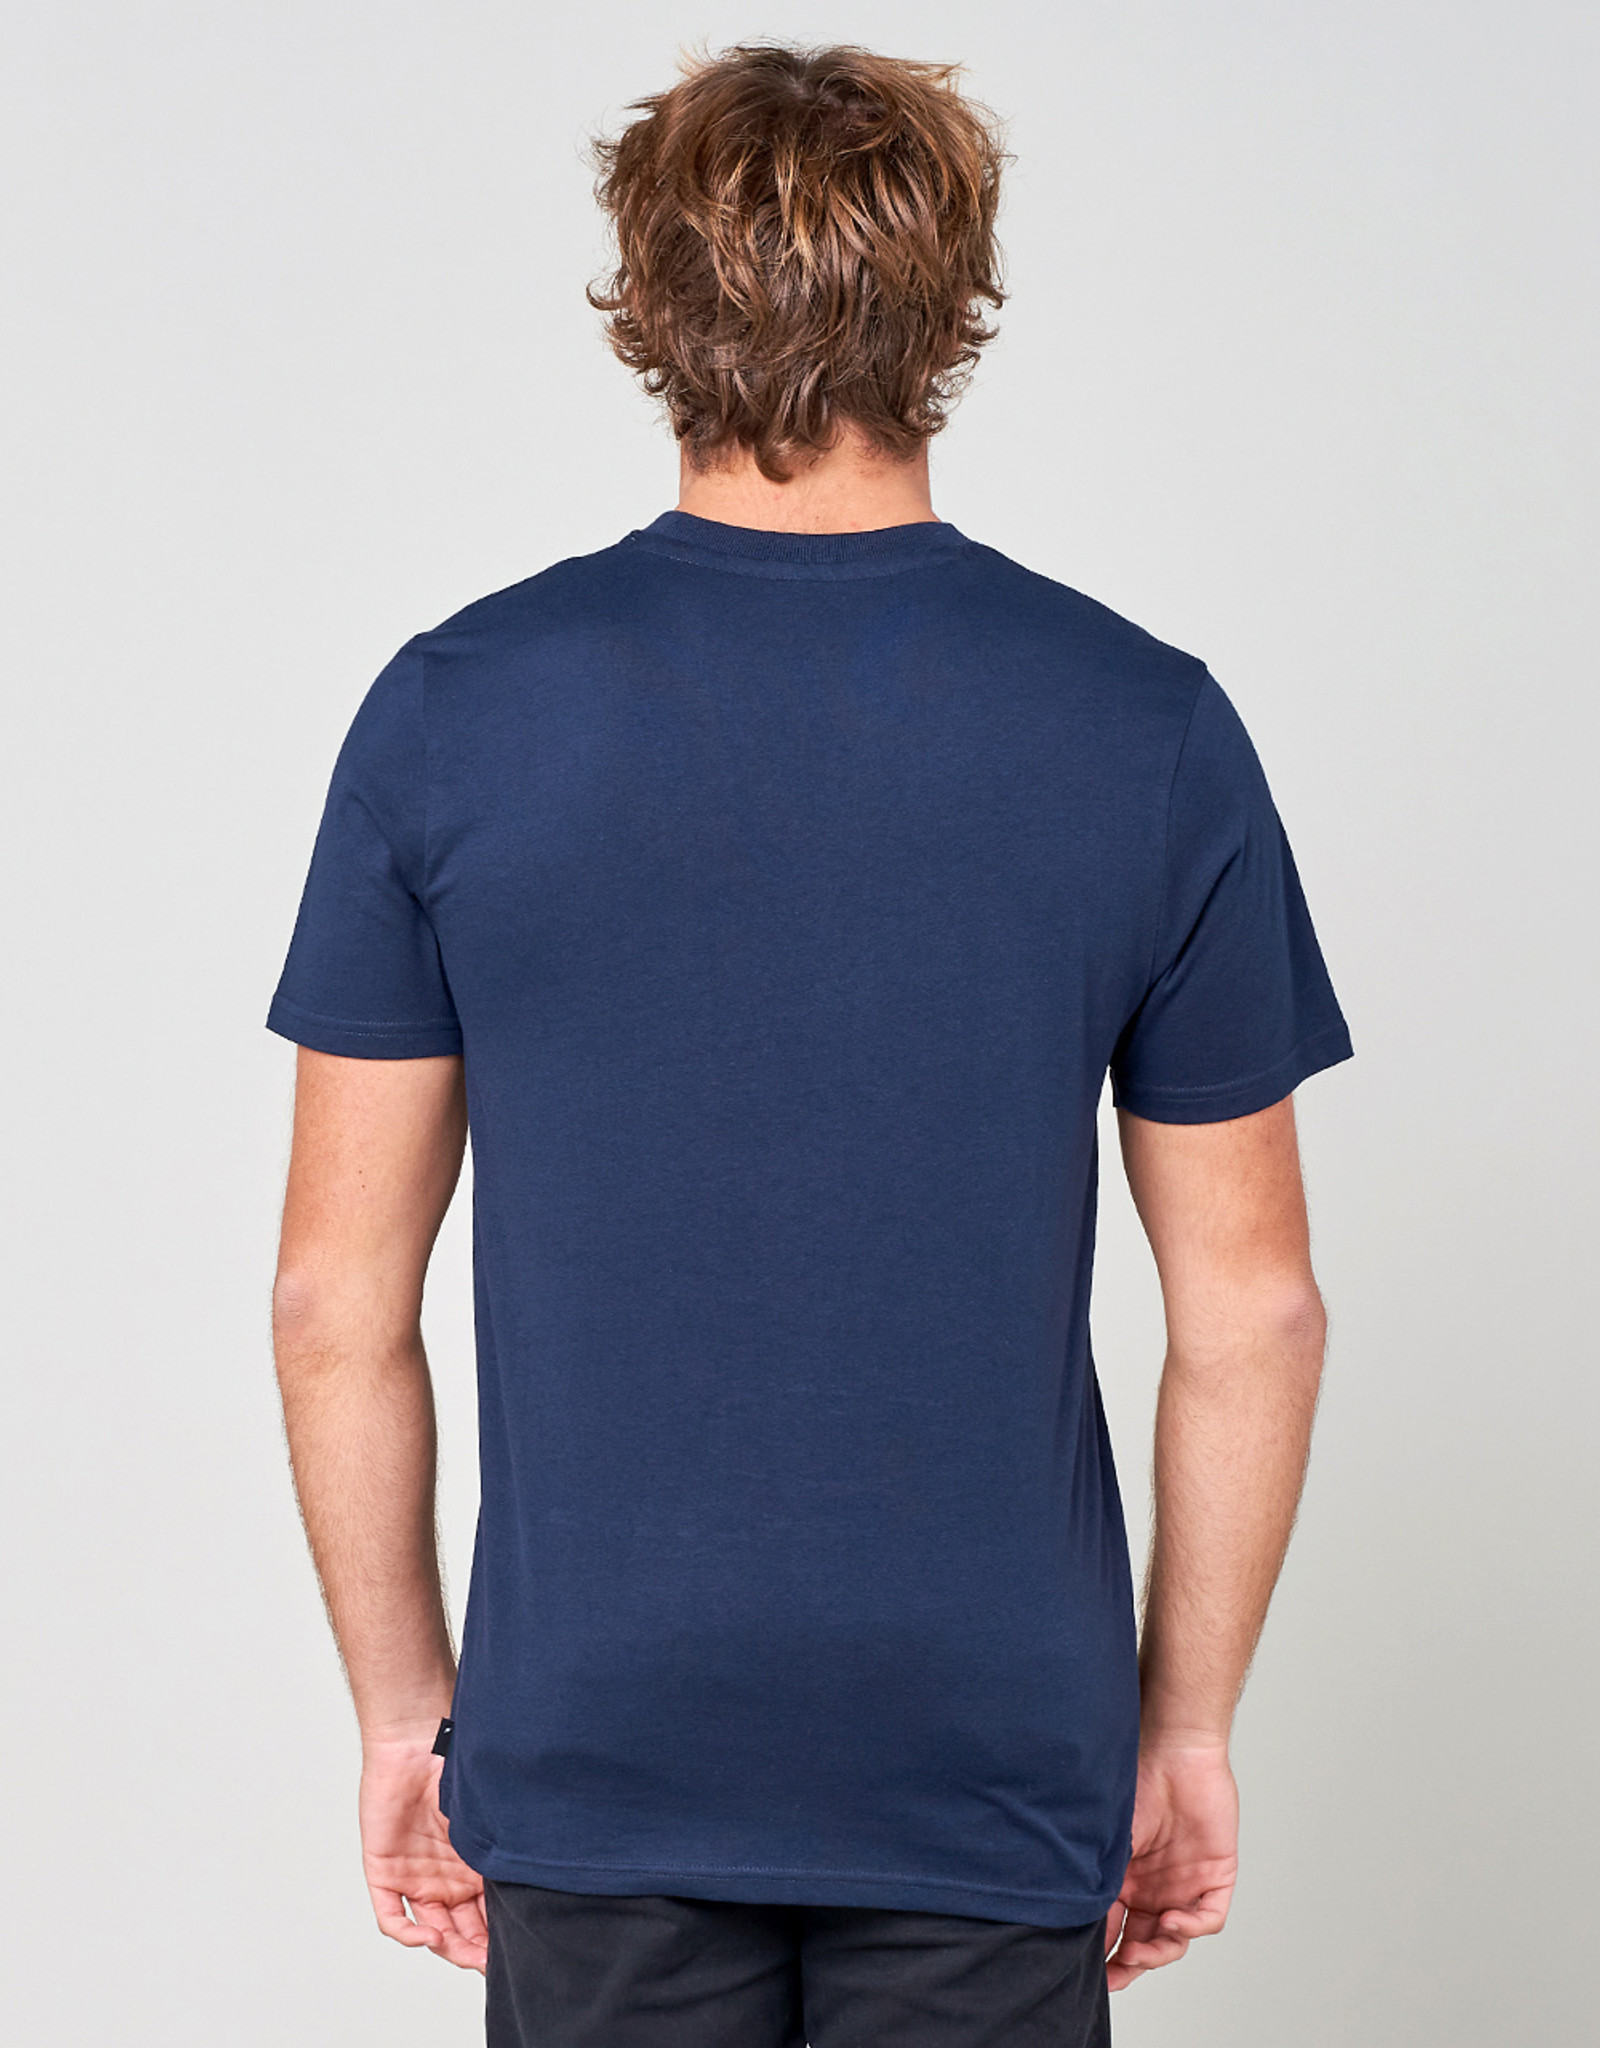 RIP CURL Down the Line Stripe Short Sleeve T-Shirt